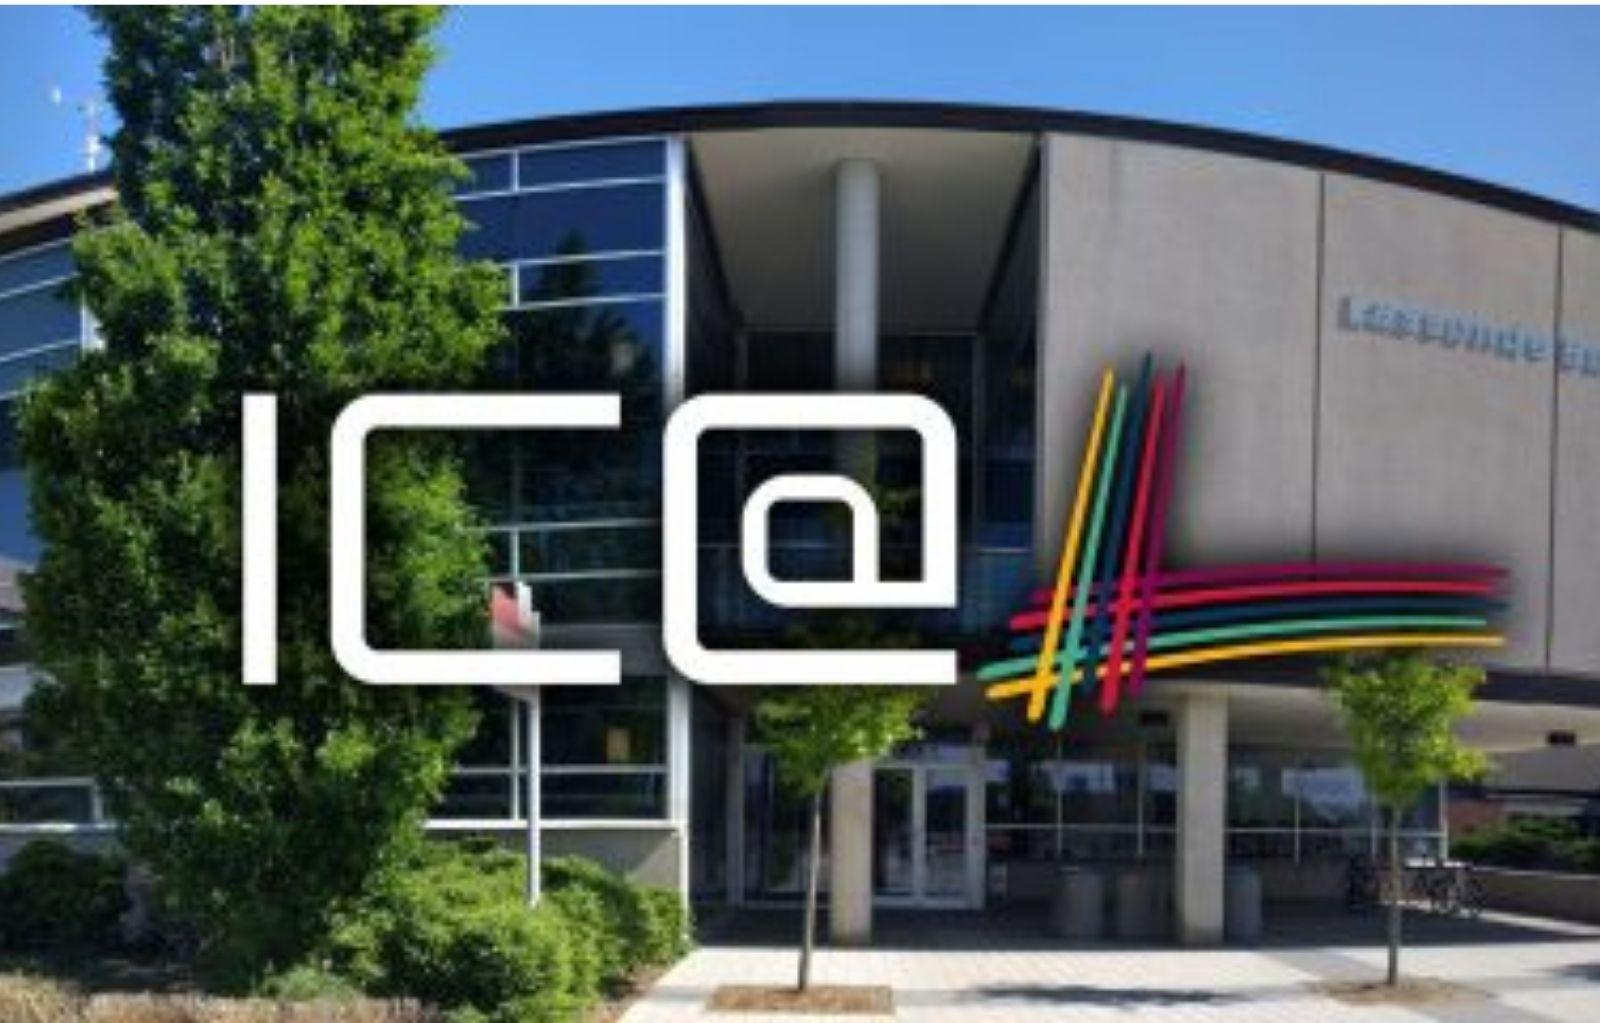 Image of IC@L logo